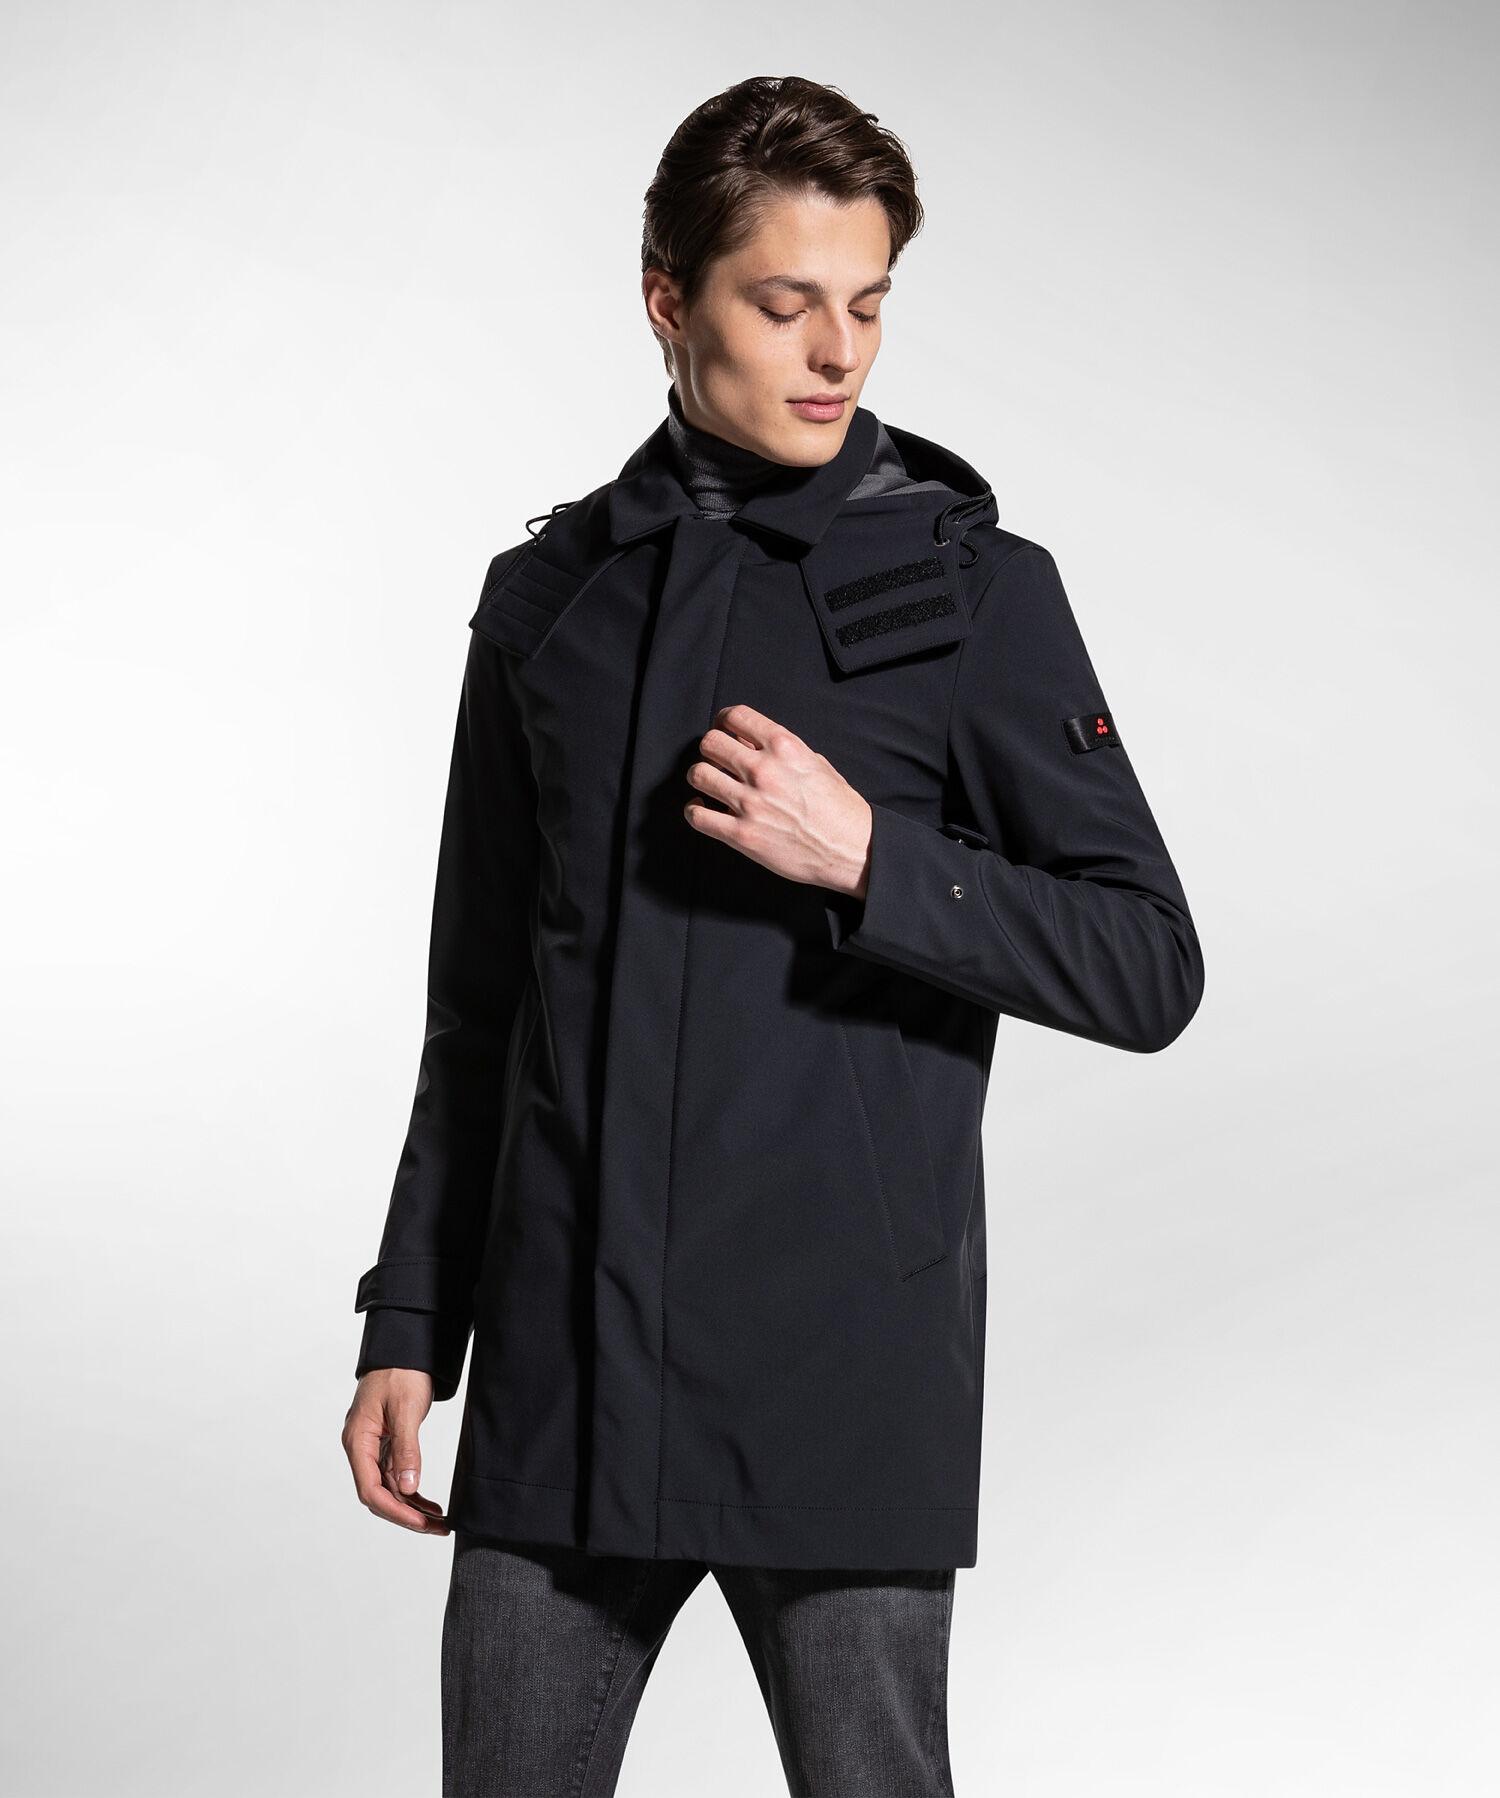 Tech urban active coat - Peuterey